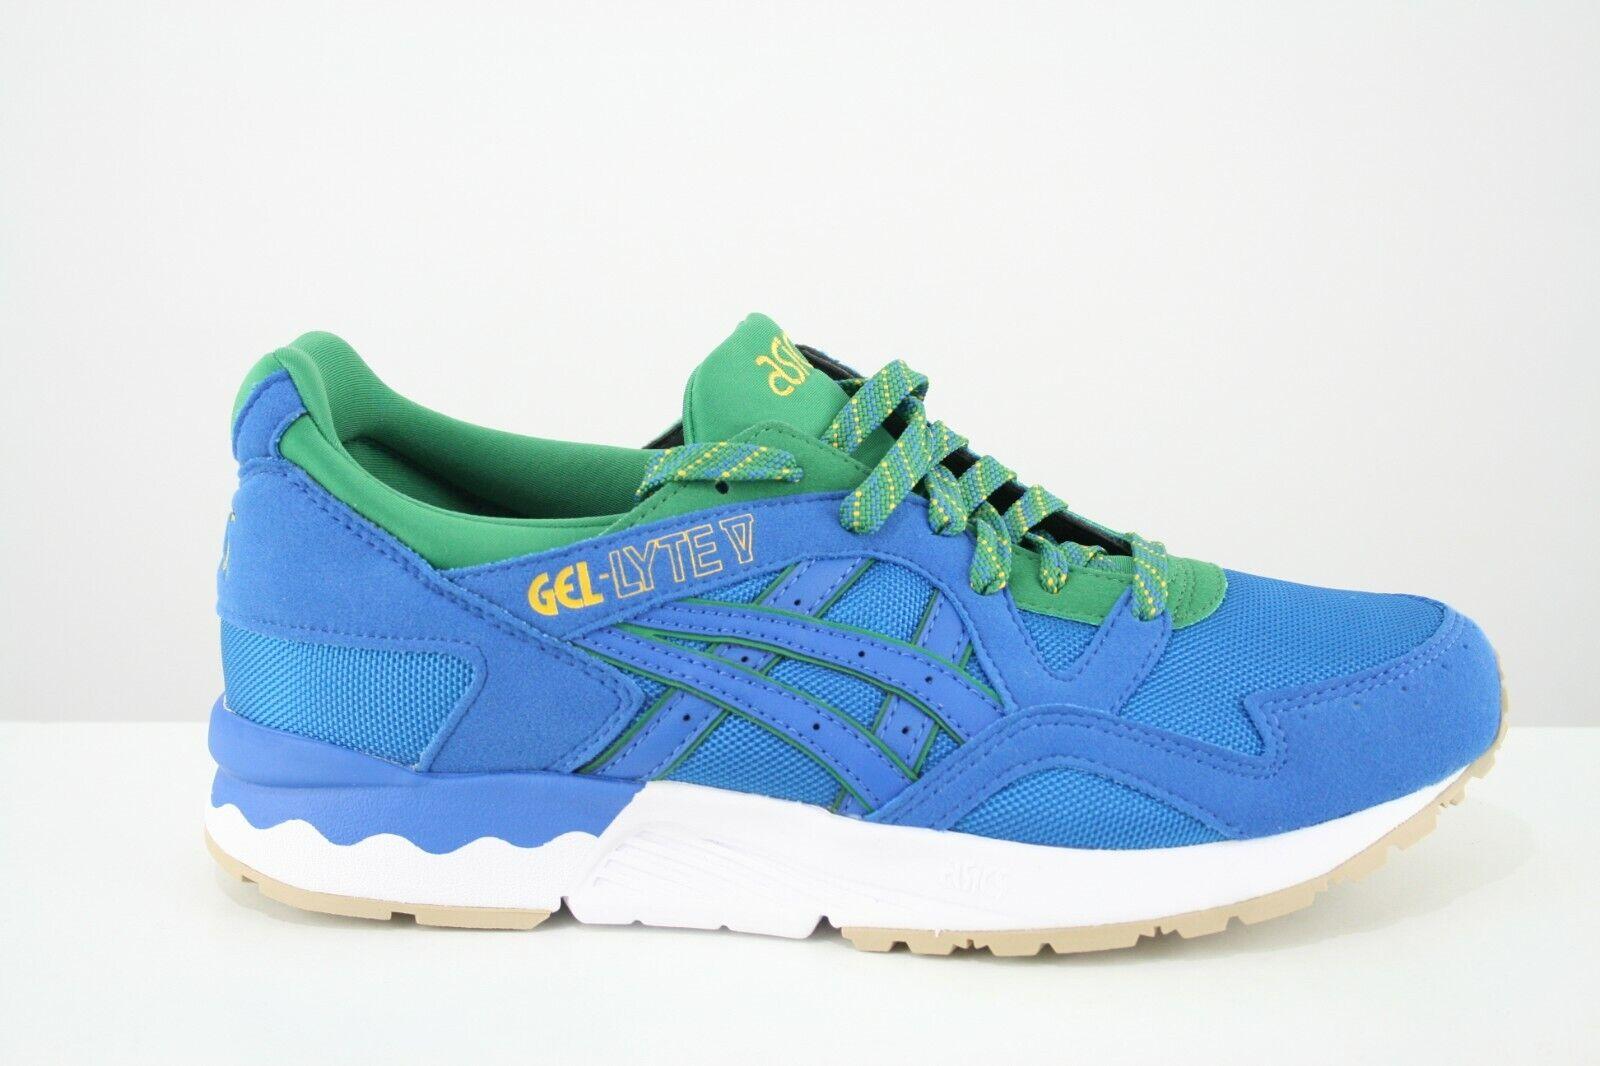 Asics Gel-Lyte V Trainers  RIO PACK  bluee Green H6R1N - UK 8.5 rrp